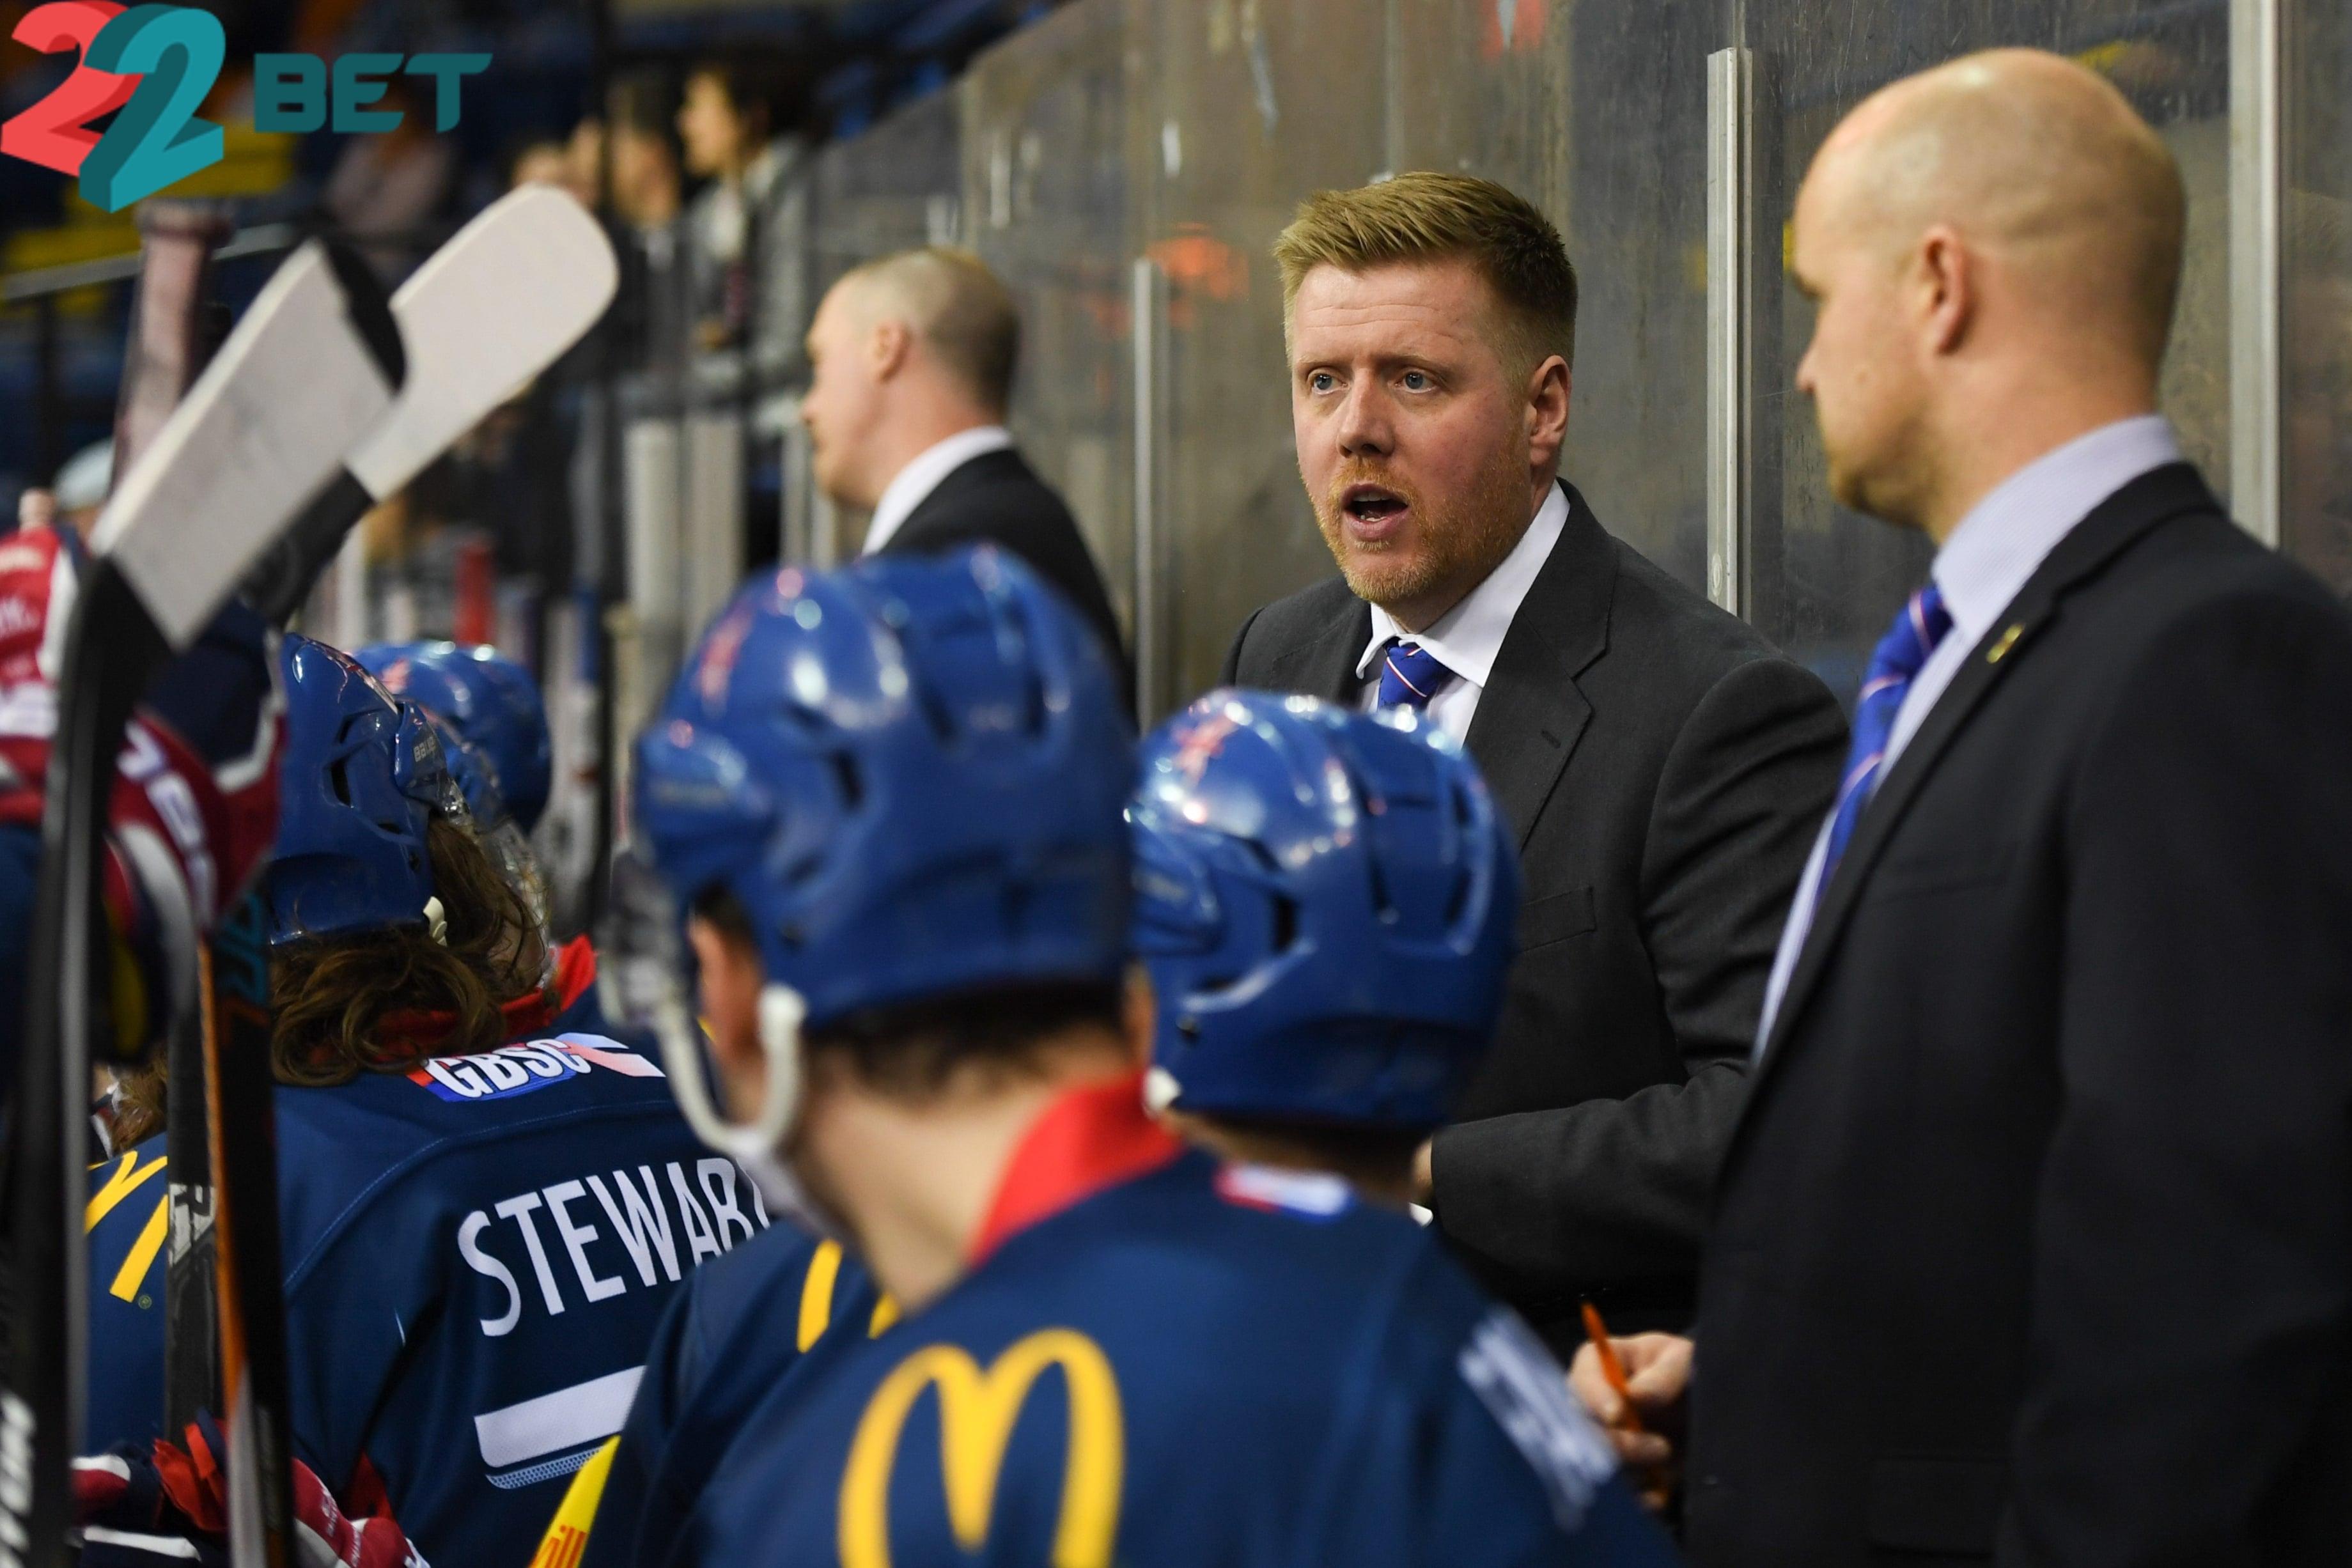 Ice Hockey team GB head coach Peter Russel talking to his team ahead of IIHF World Cup 2020.